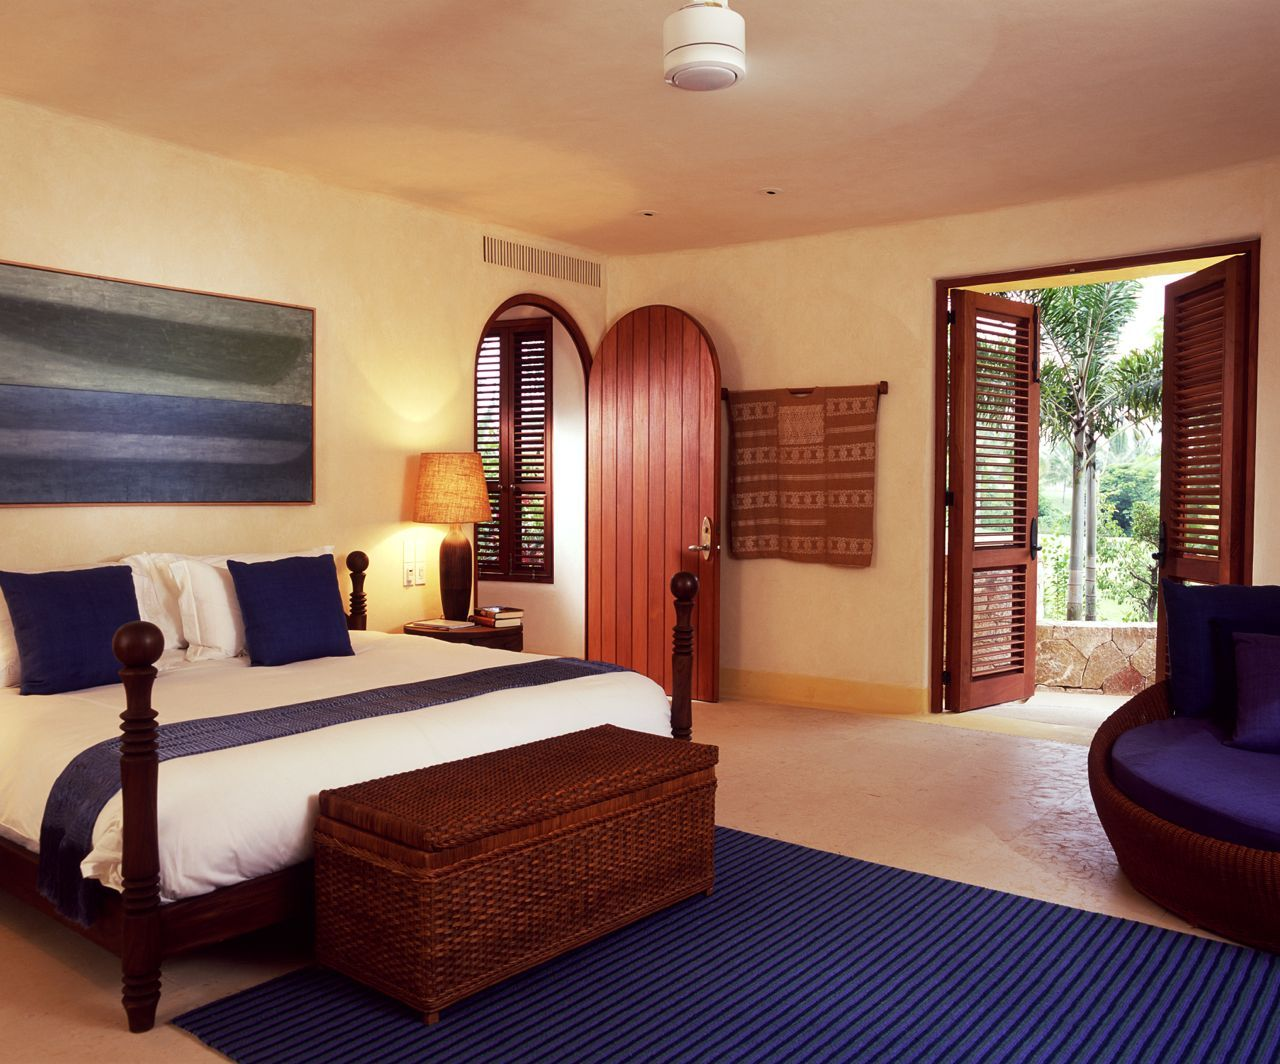 Lovely Guest Suite At Palmasola Punta Mita